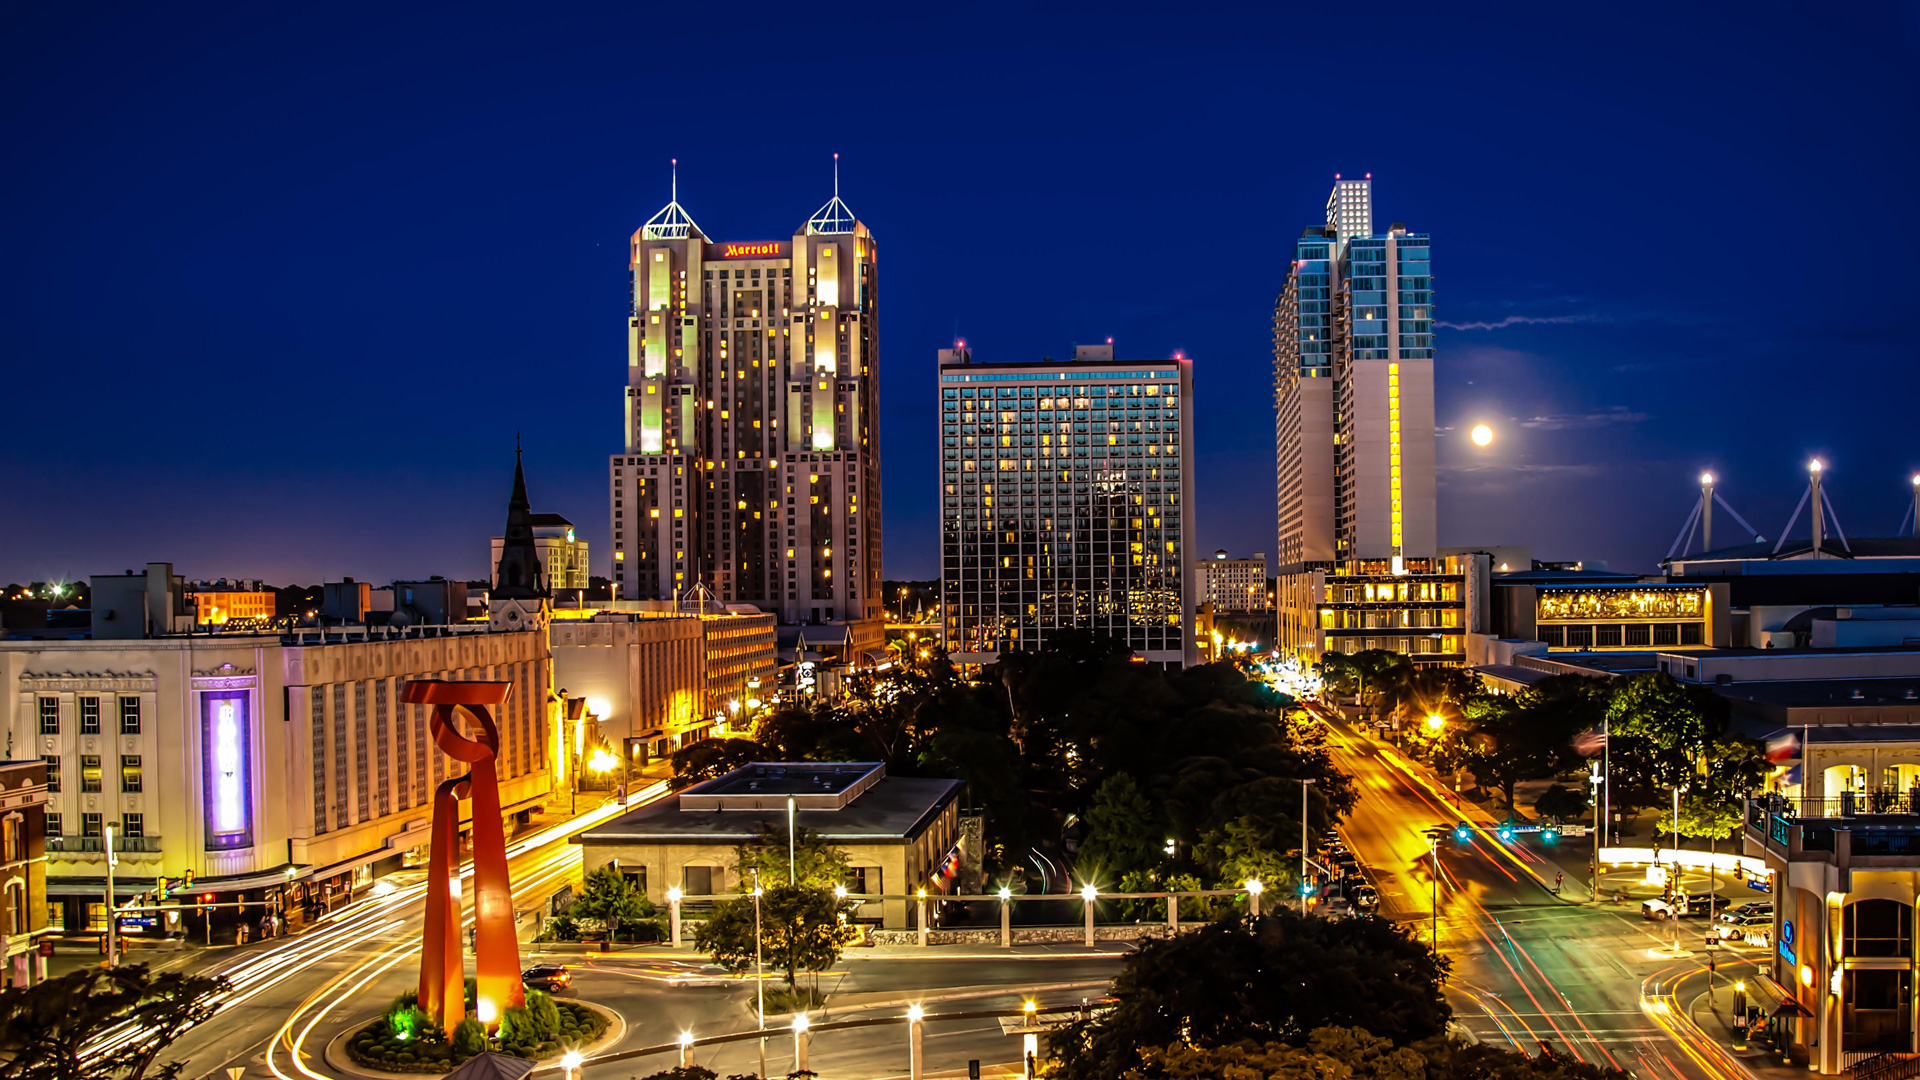 San Antonio, Texas skyline